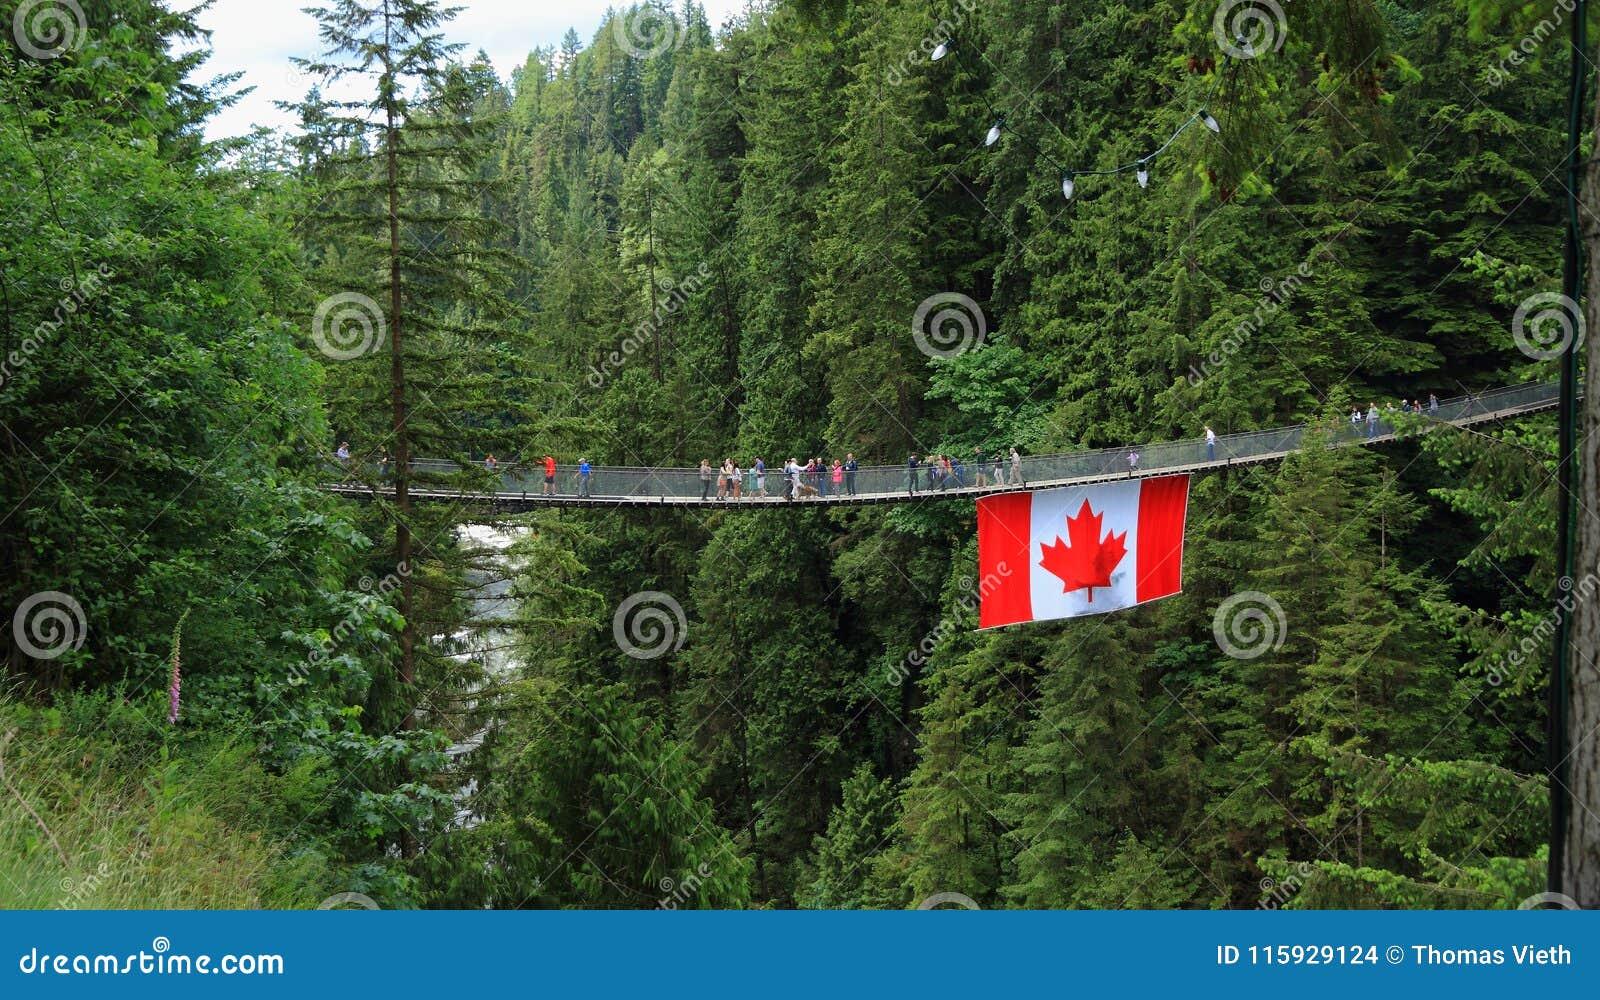 Vancouver, Canada: Tourism - Capilano Suspension Bridge with Canadian Flag